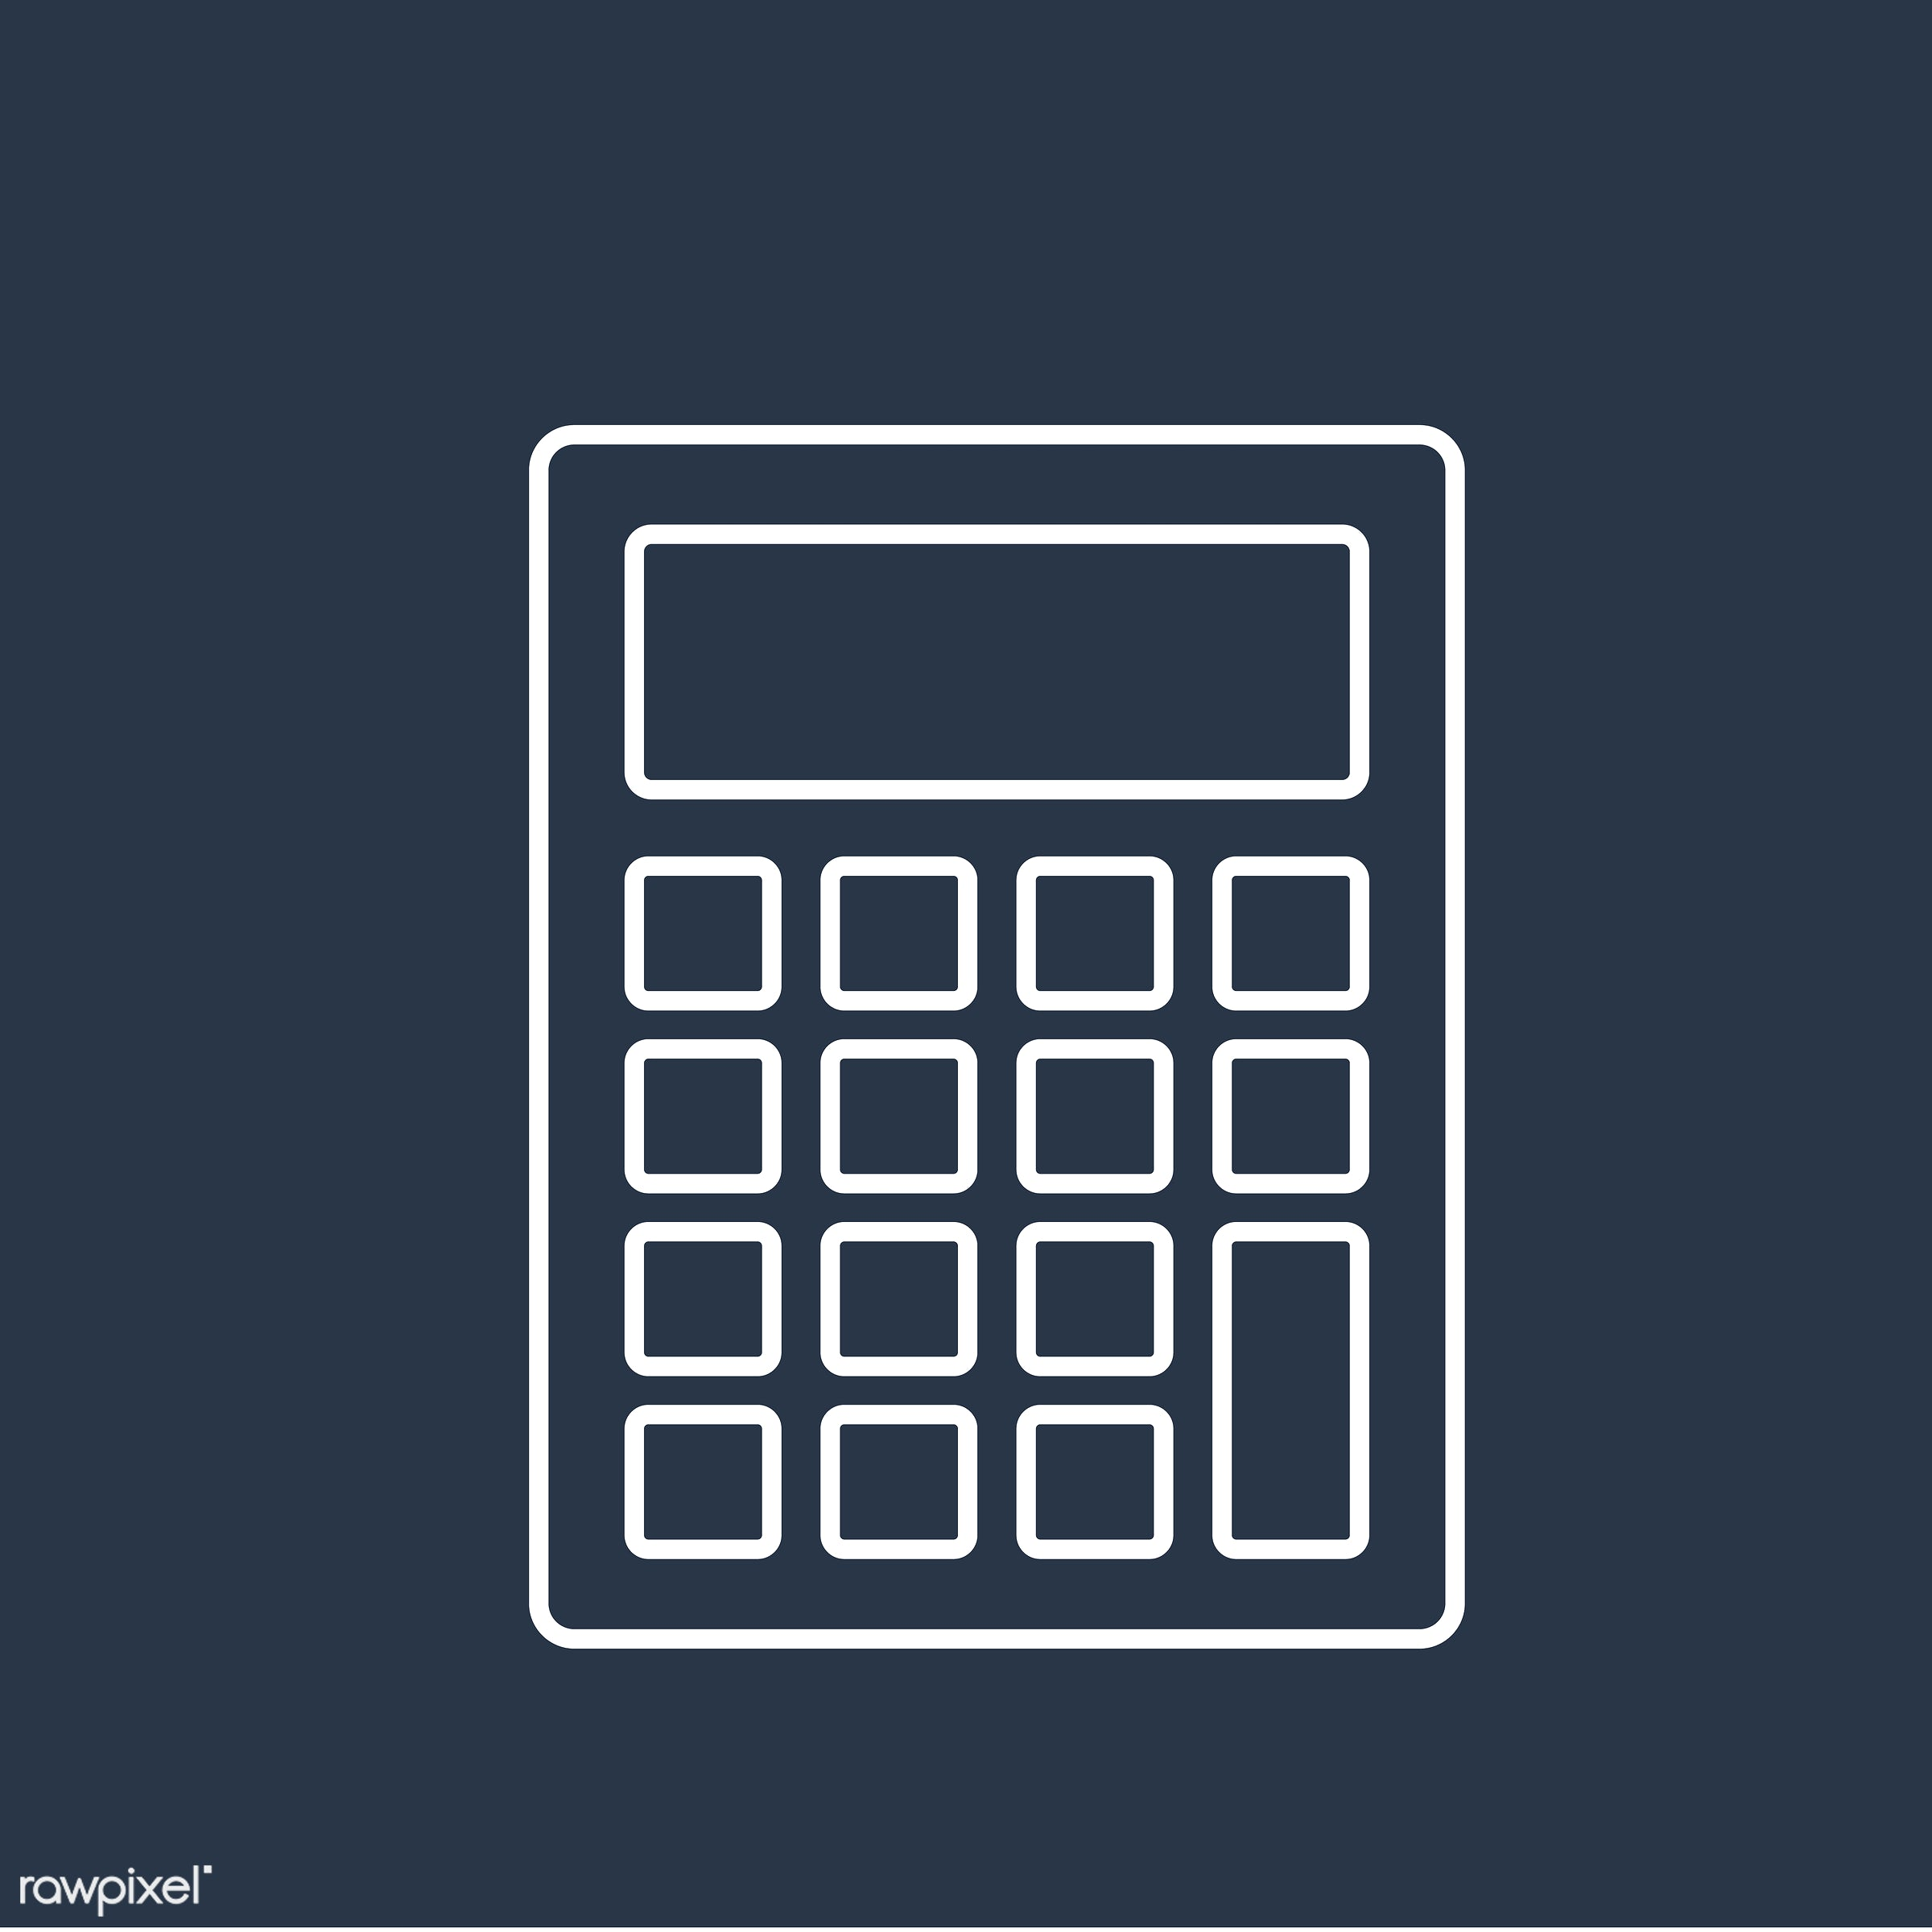 Vector of calculator icon - calculator, equipment, finance, graphic, icon, illustration, mathematics, object, office, vector...